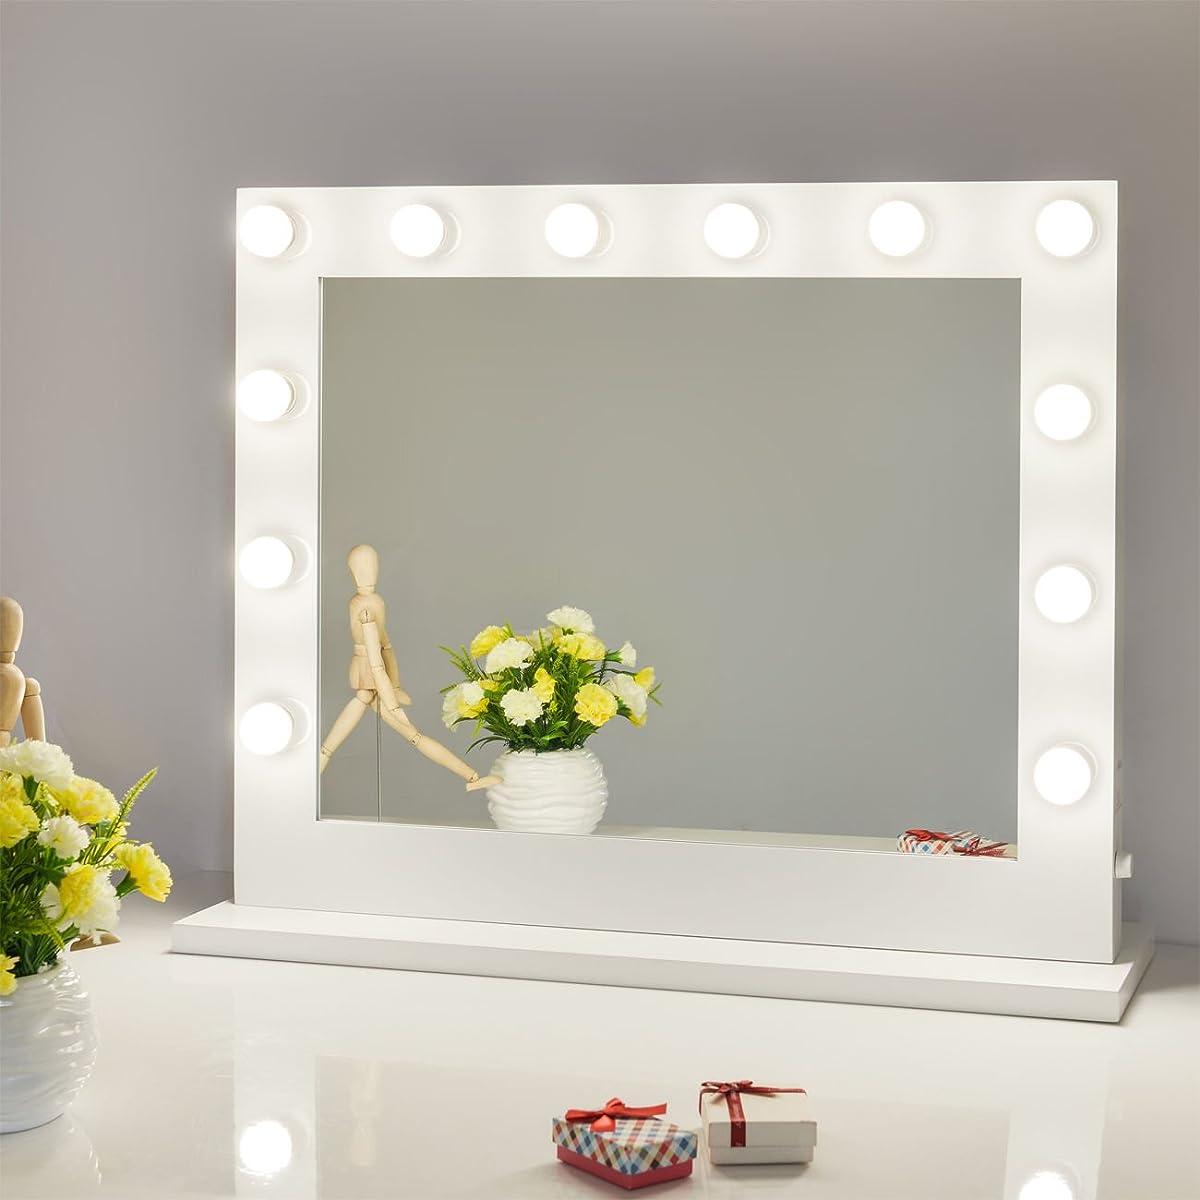 Hollywood Lighted Makeup Vanity Mirror Light